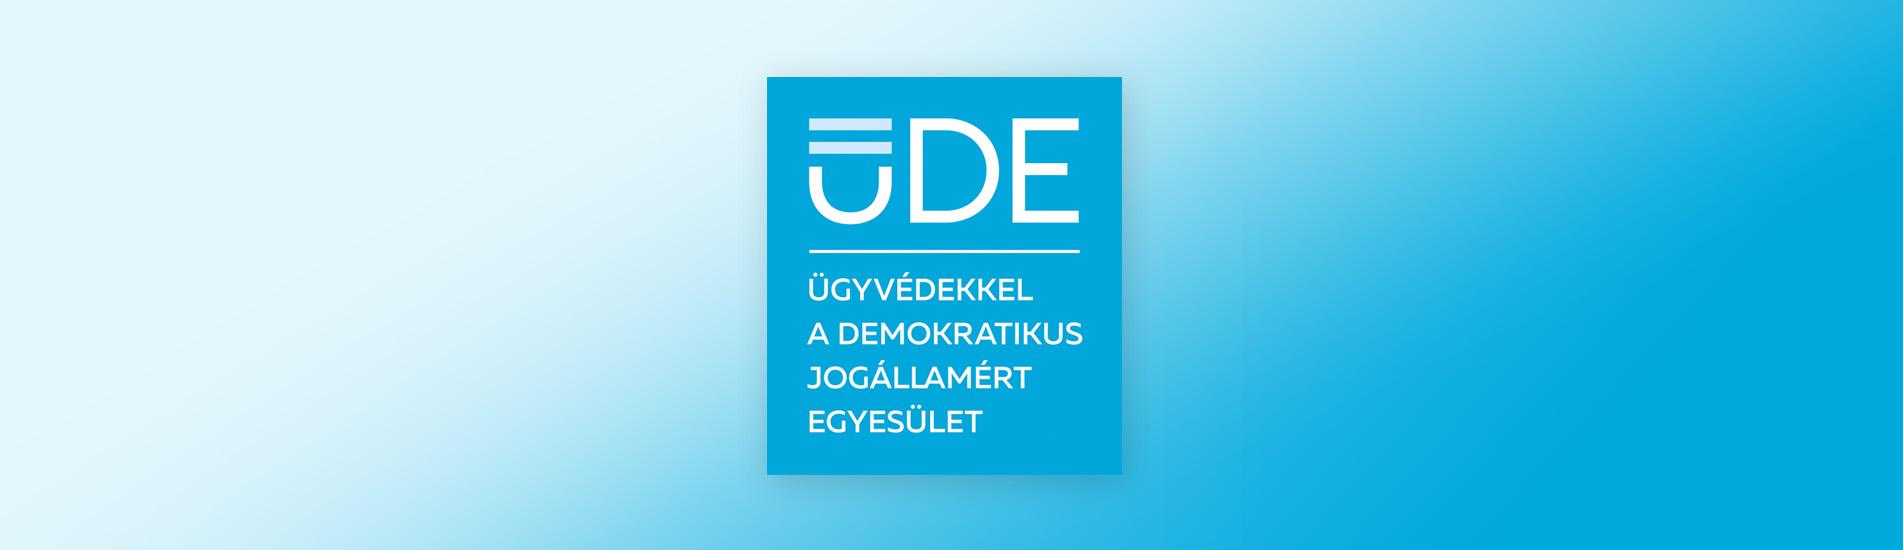 UDE-image2